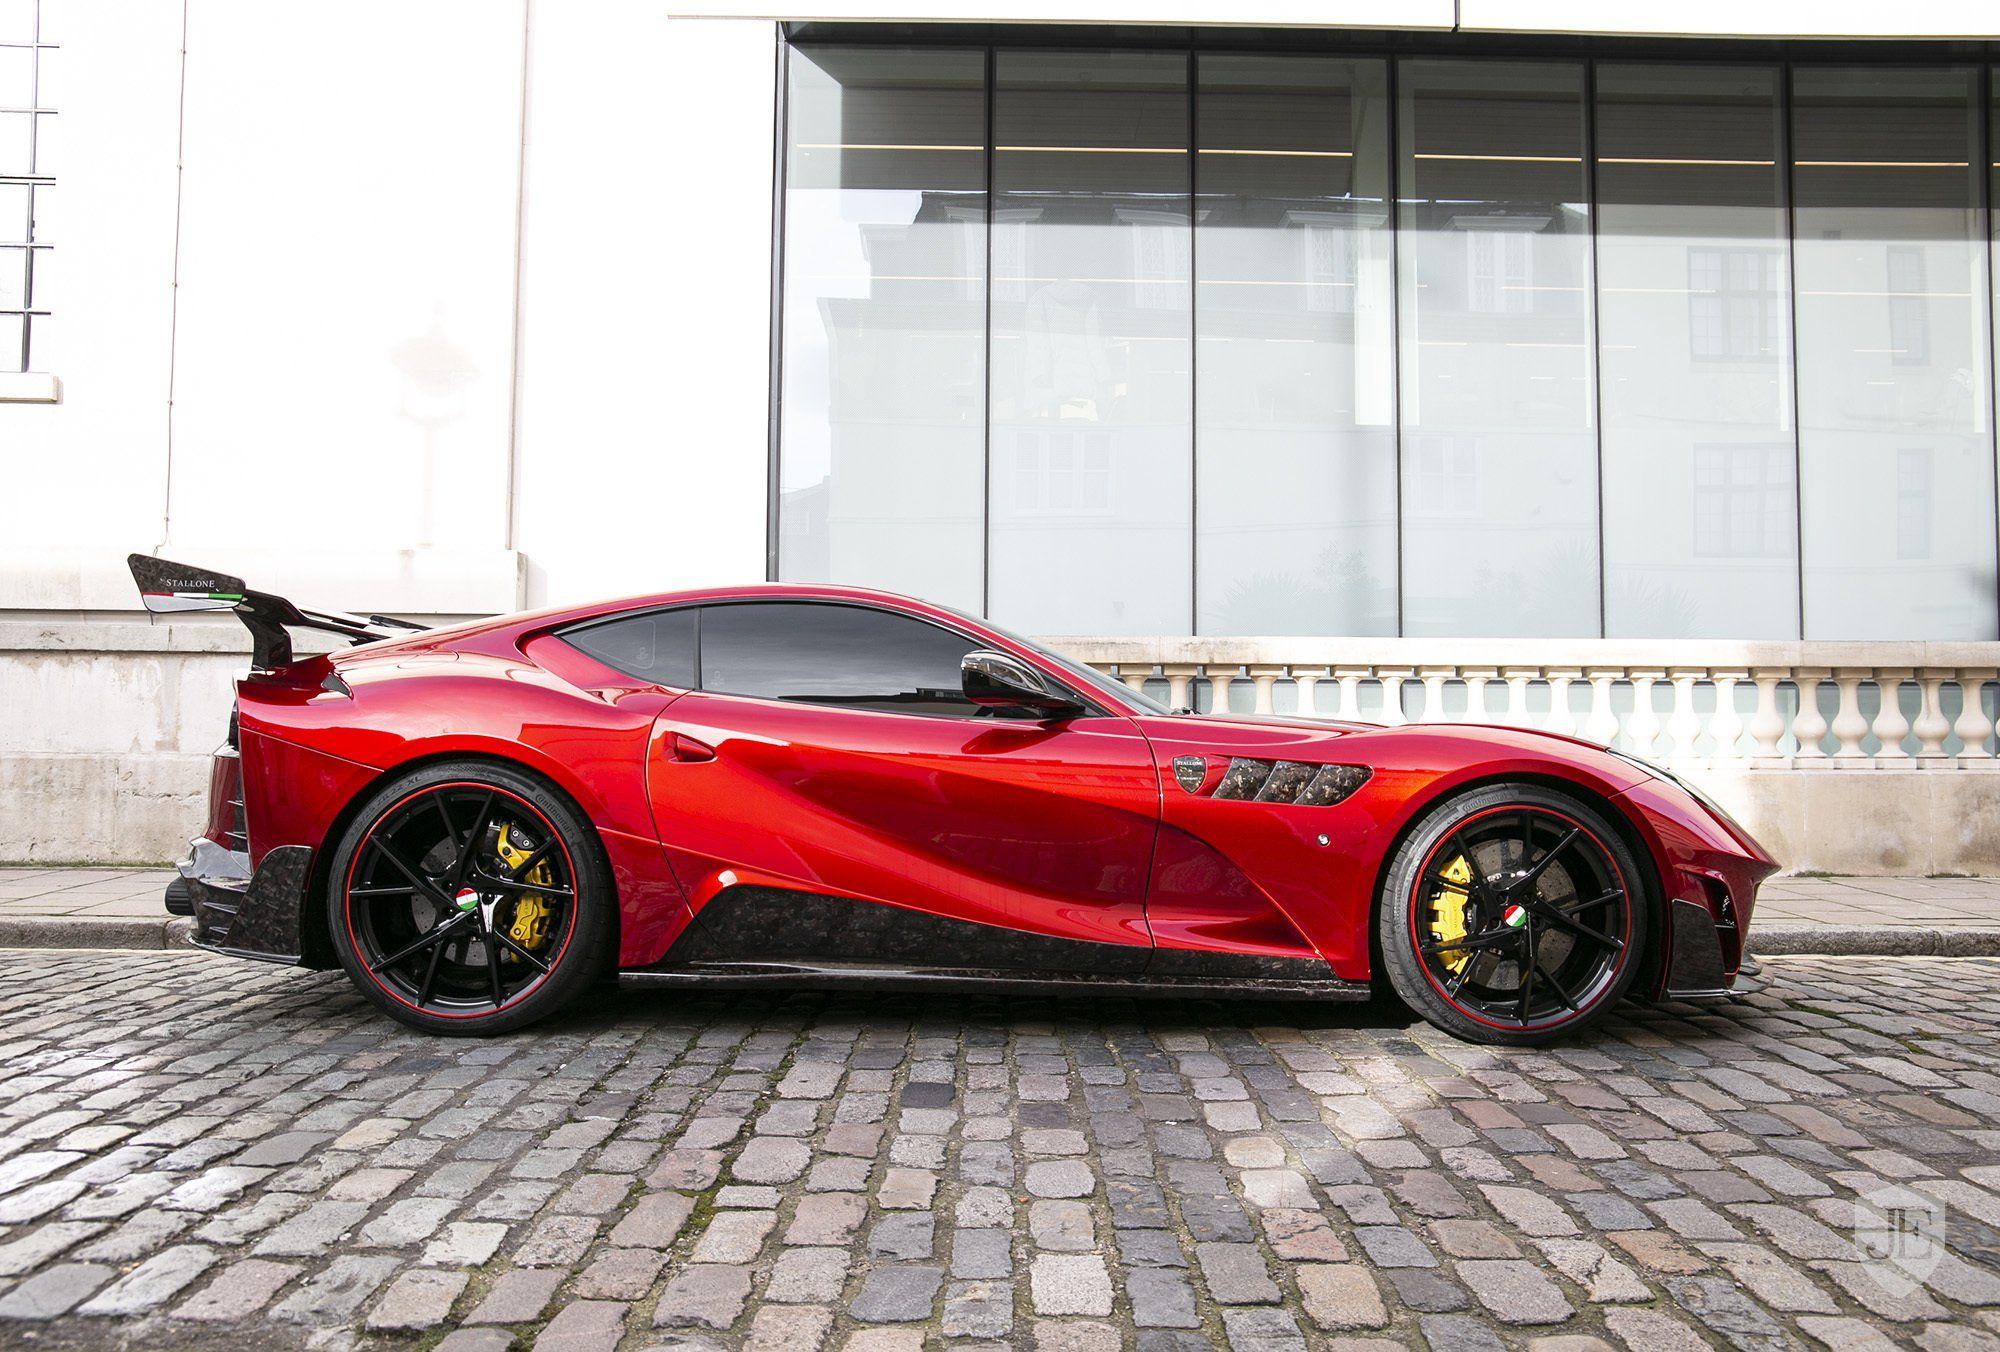 2018 Ferrari 812 Superfast In United Kingdom For Sale 10473883 Ferrari Used Luxury Cars Luxury Cars For Sale